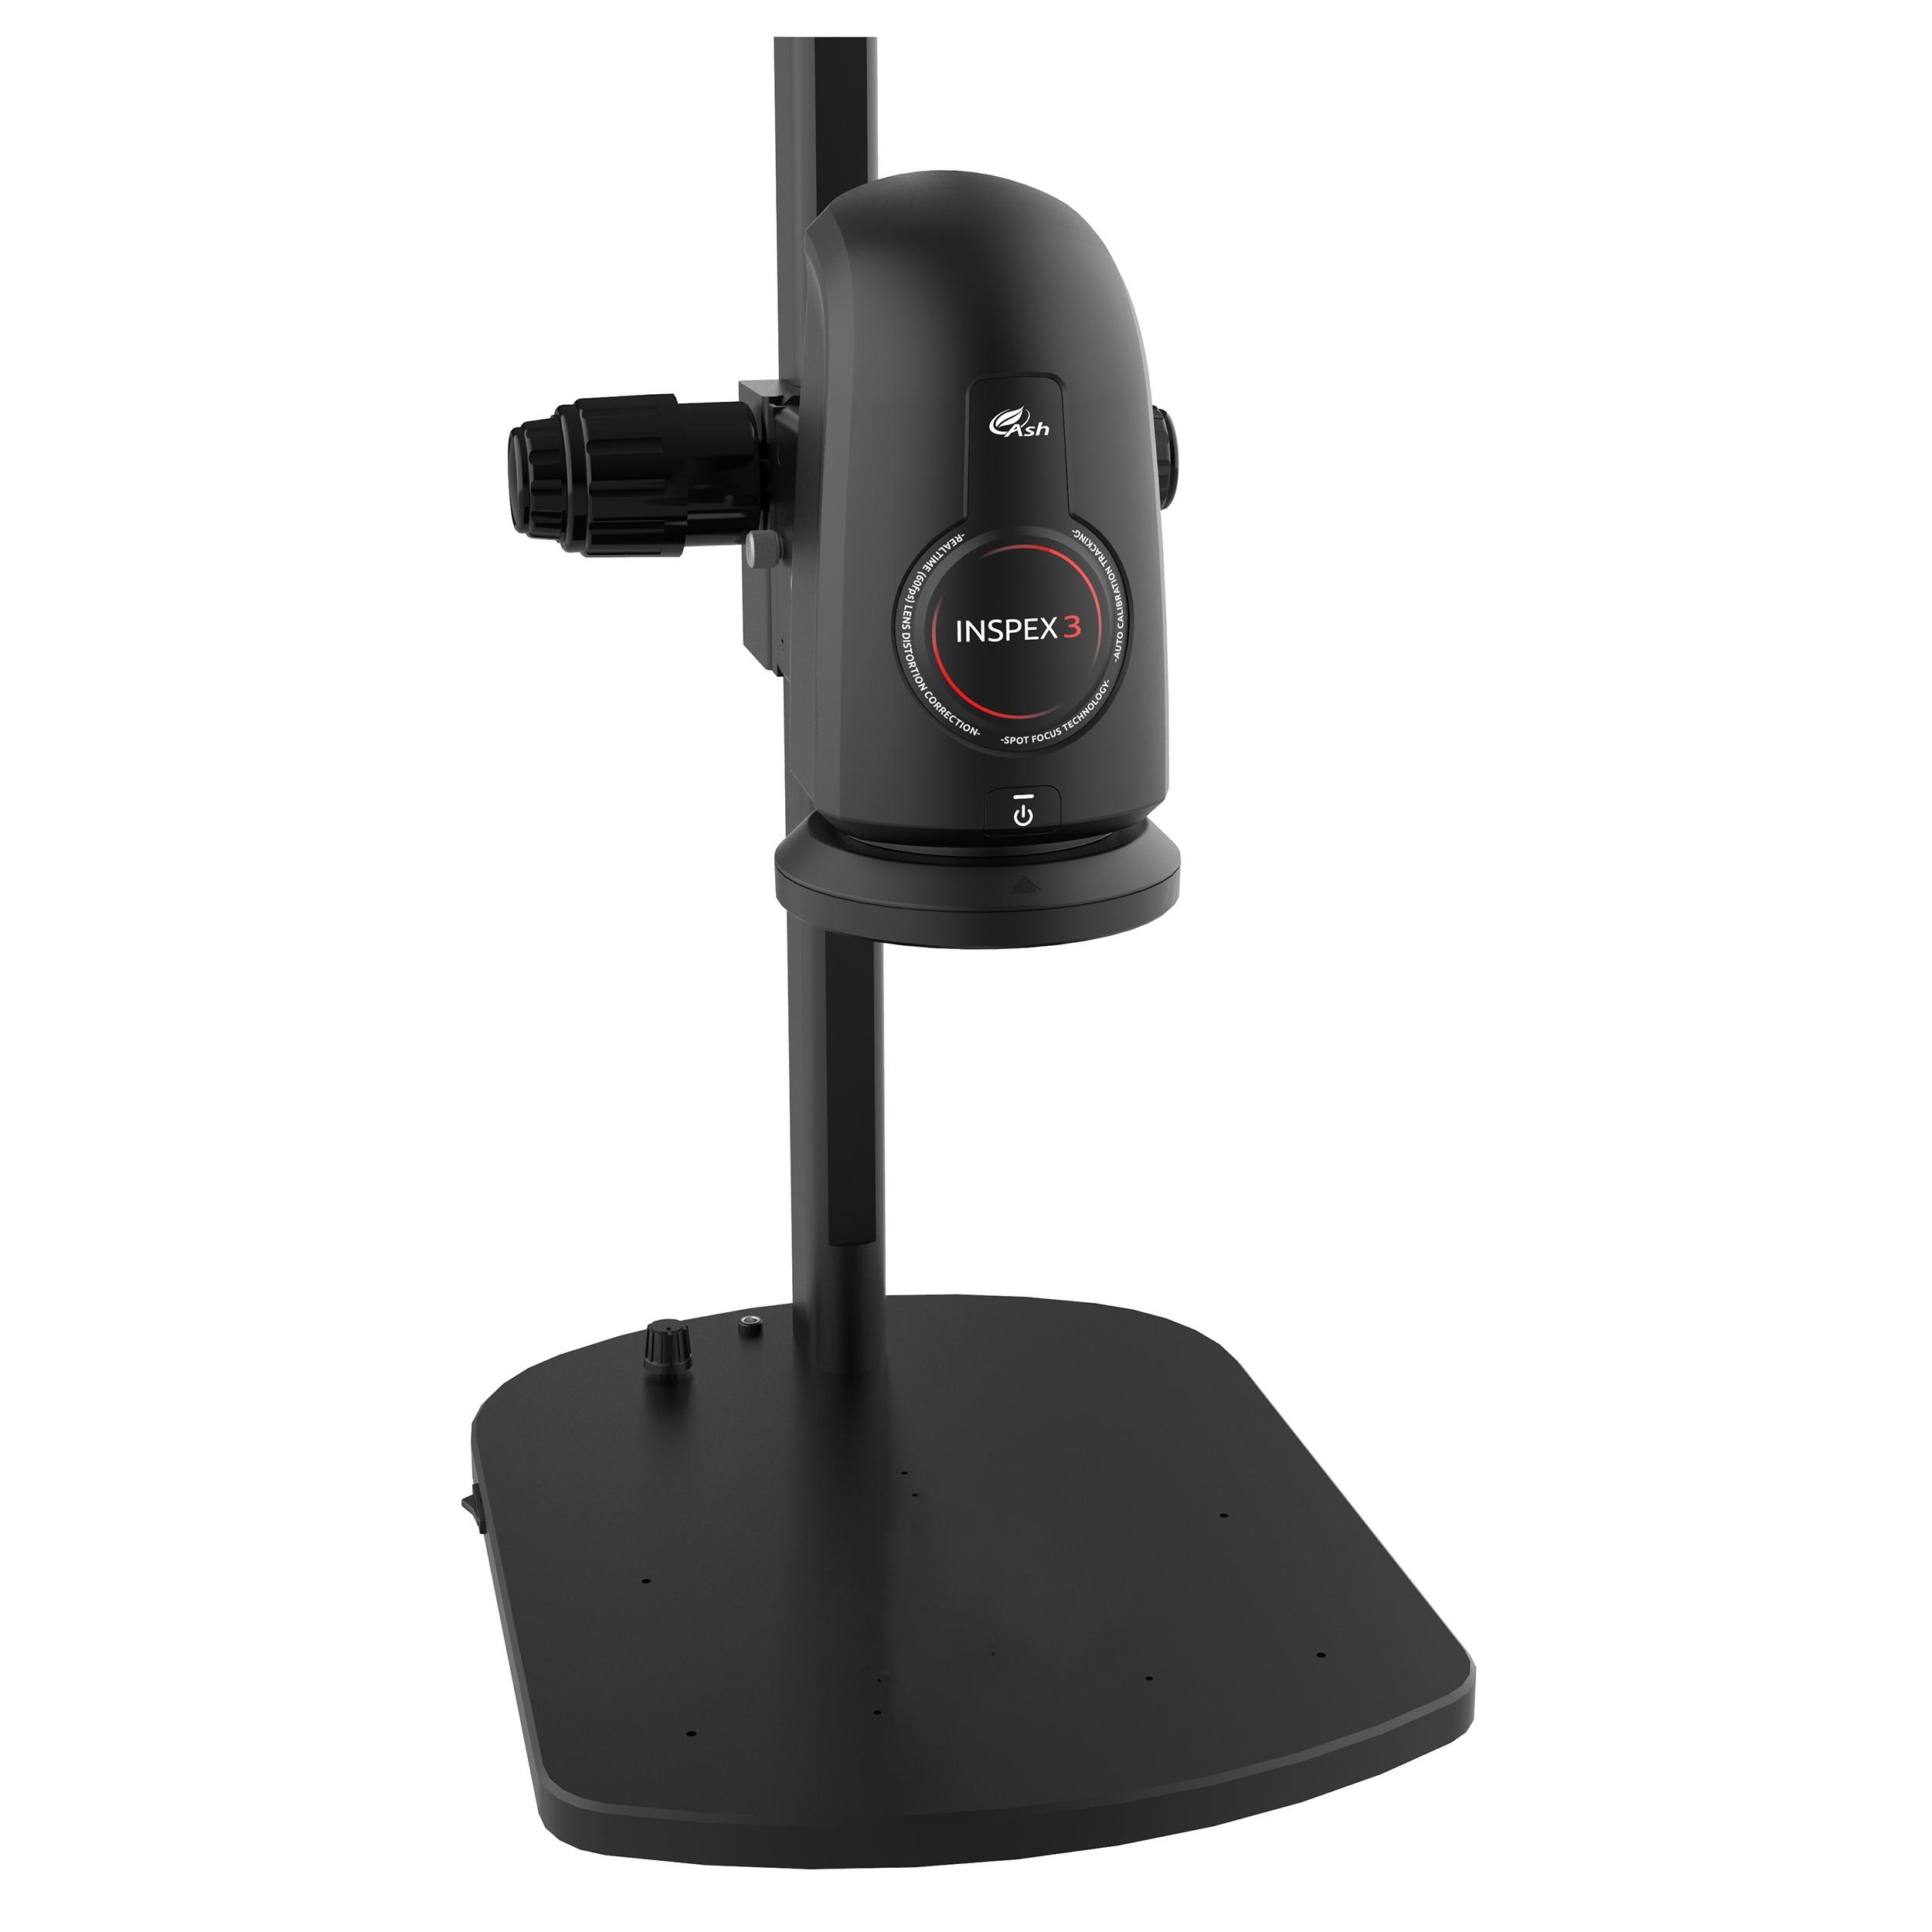 Inspex 3 Smart Inspection Digital Microscope